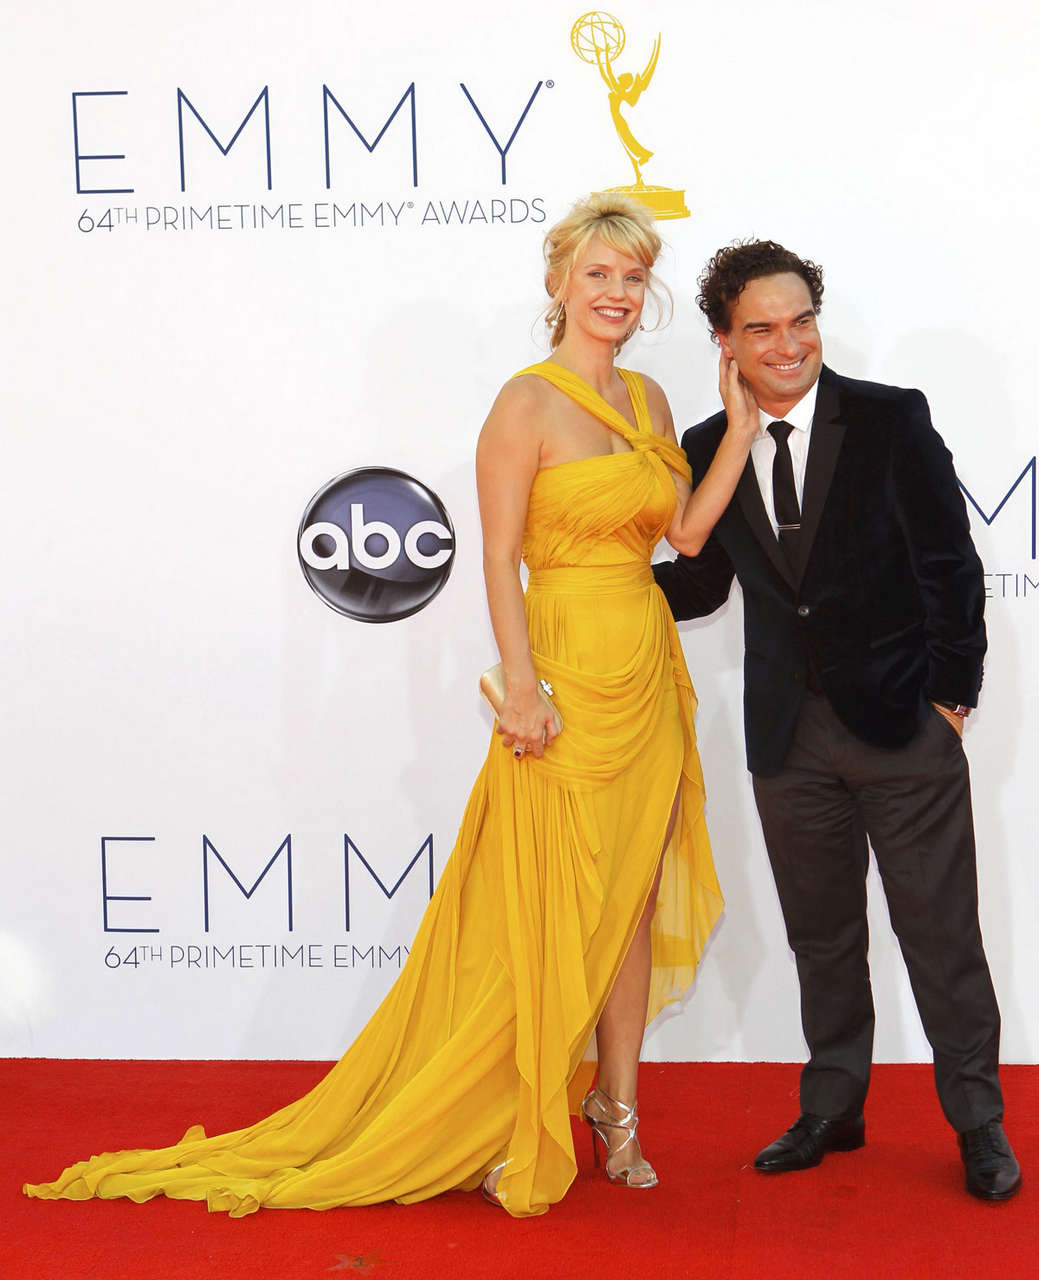 Kelli Garner 64th Primetime Emmy Awards Los Angeles